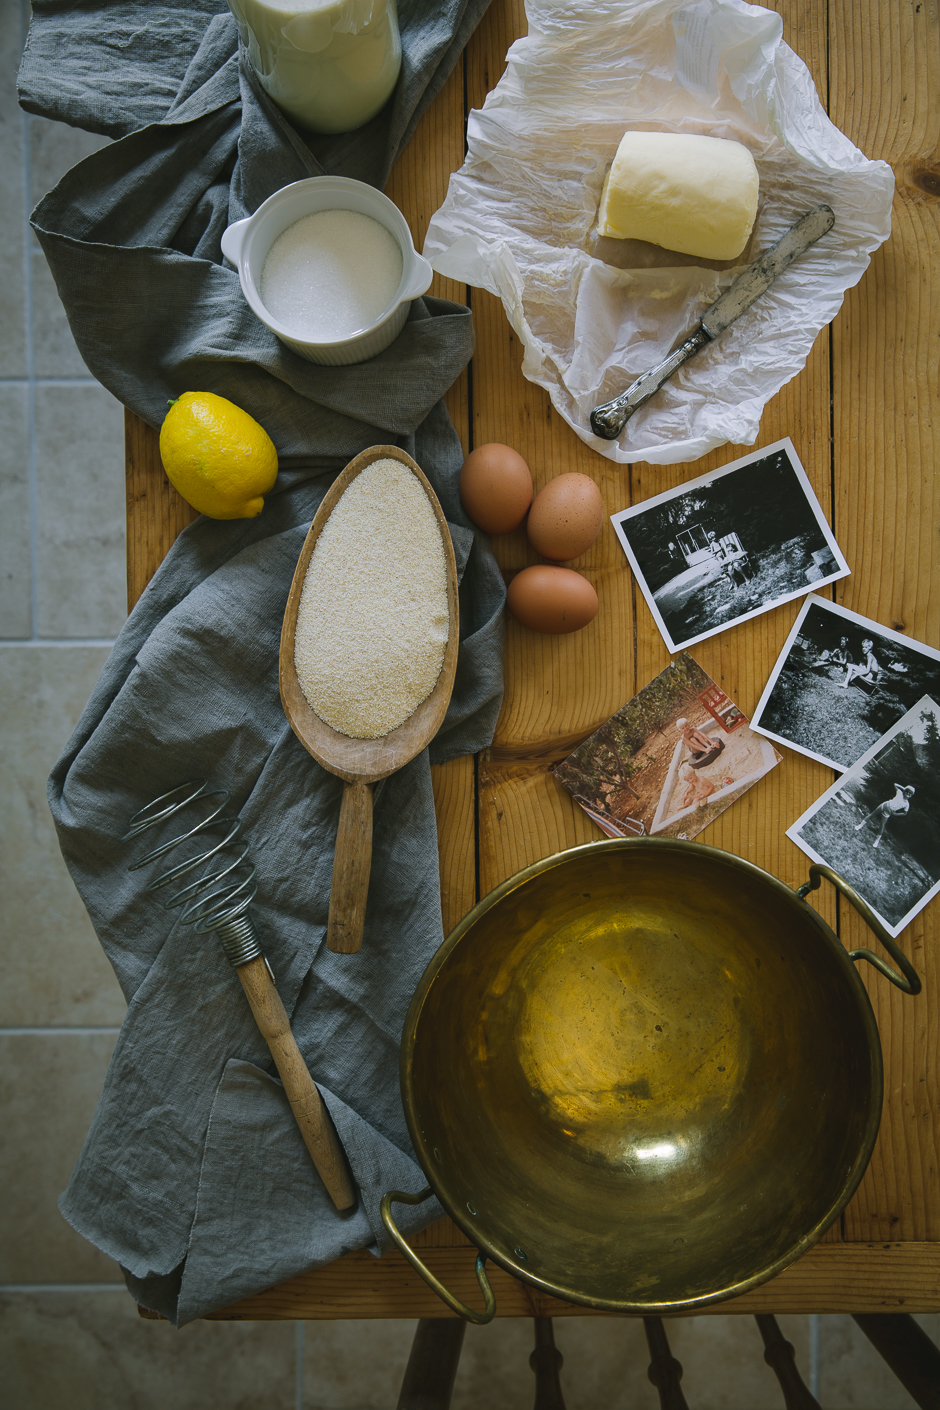 darafelfújt az Emlékek Íze vidéki konyhájából/semolina soufflé from the Taste of Memories Hungarian country kitchen www.tasteofmemories.com